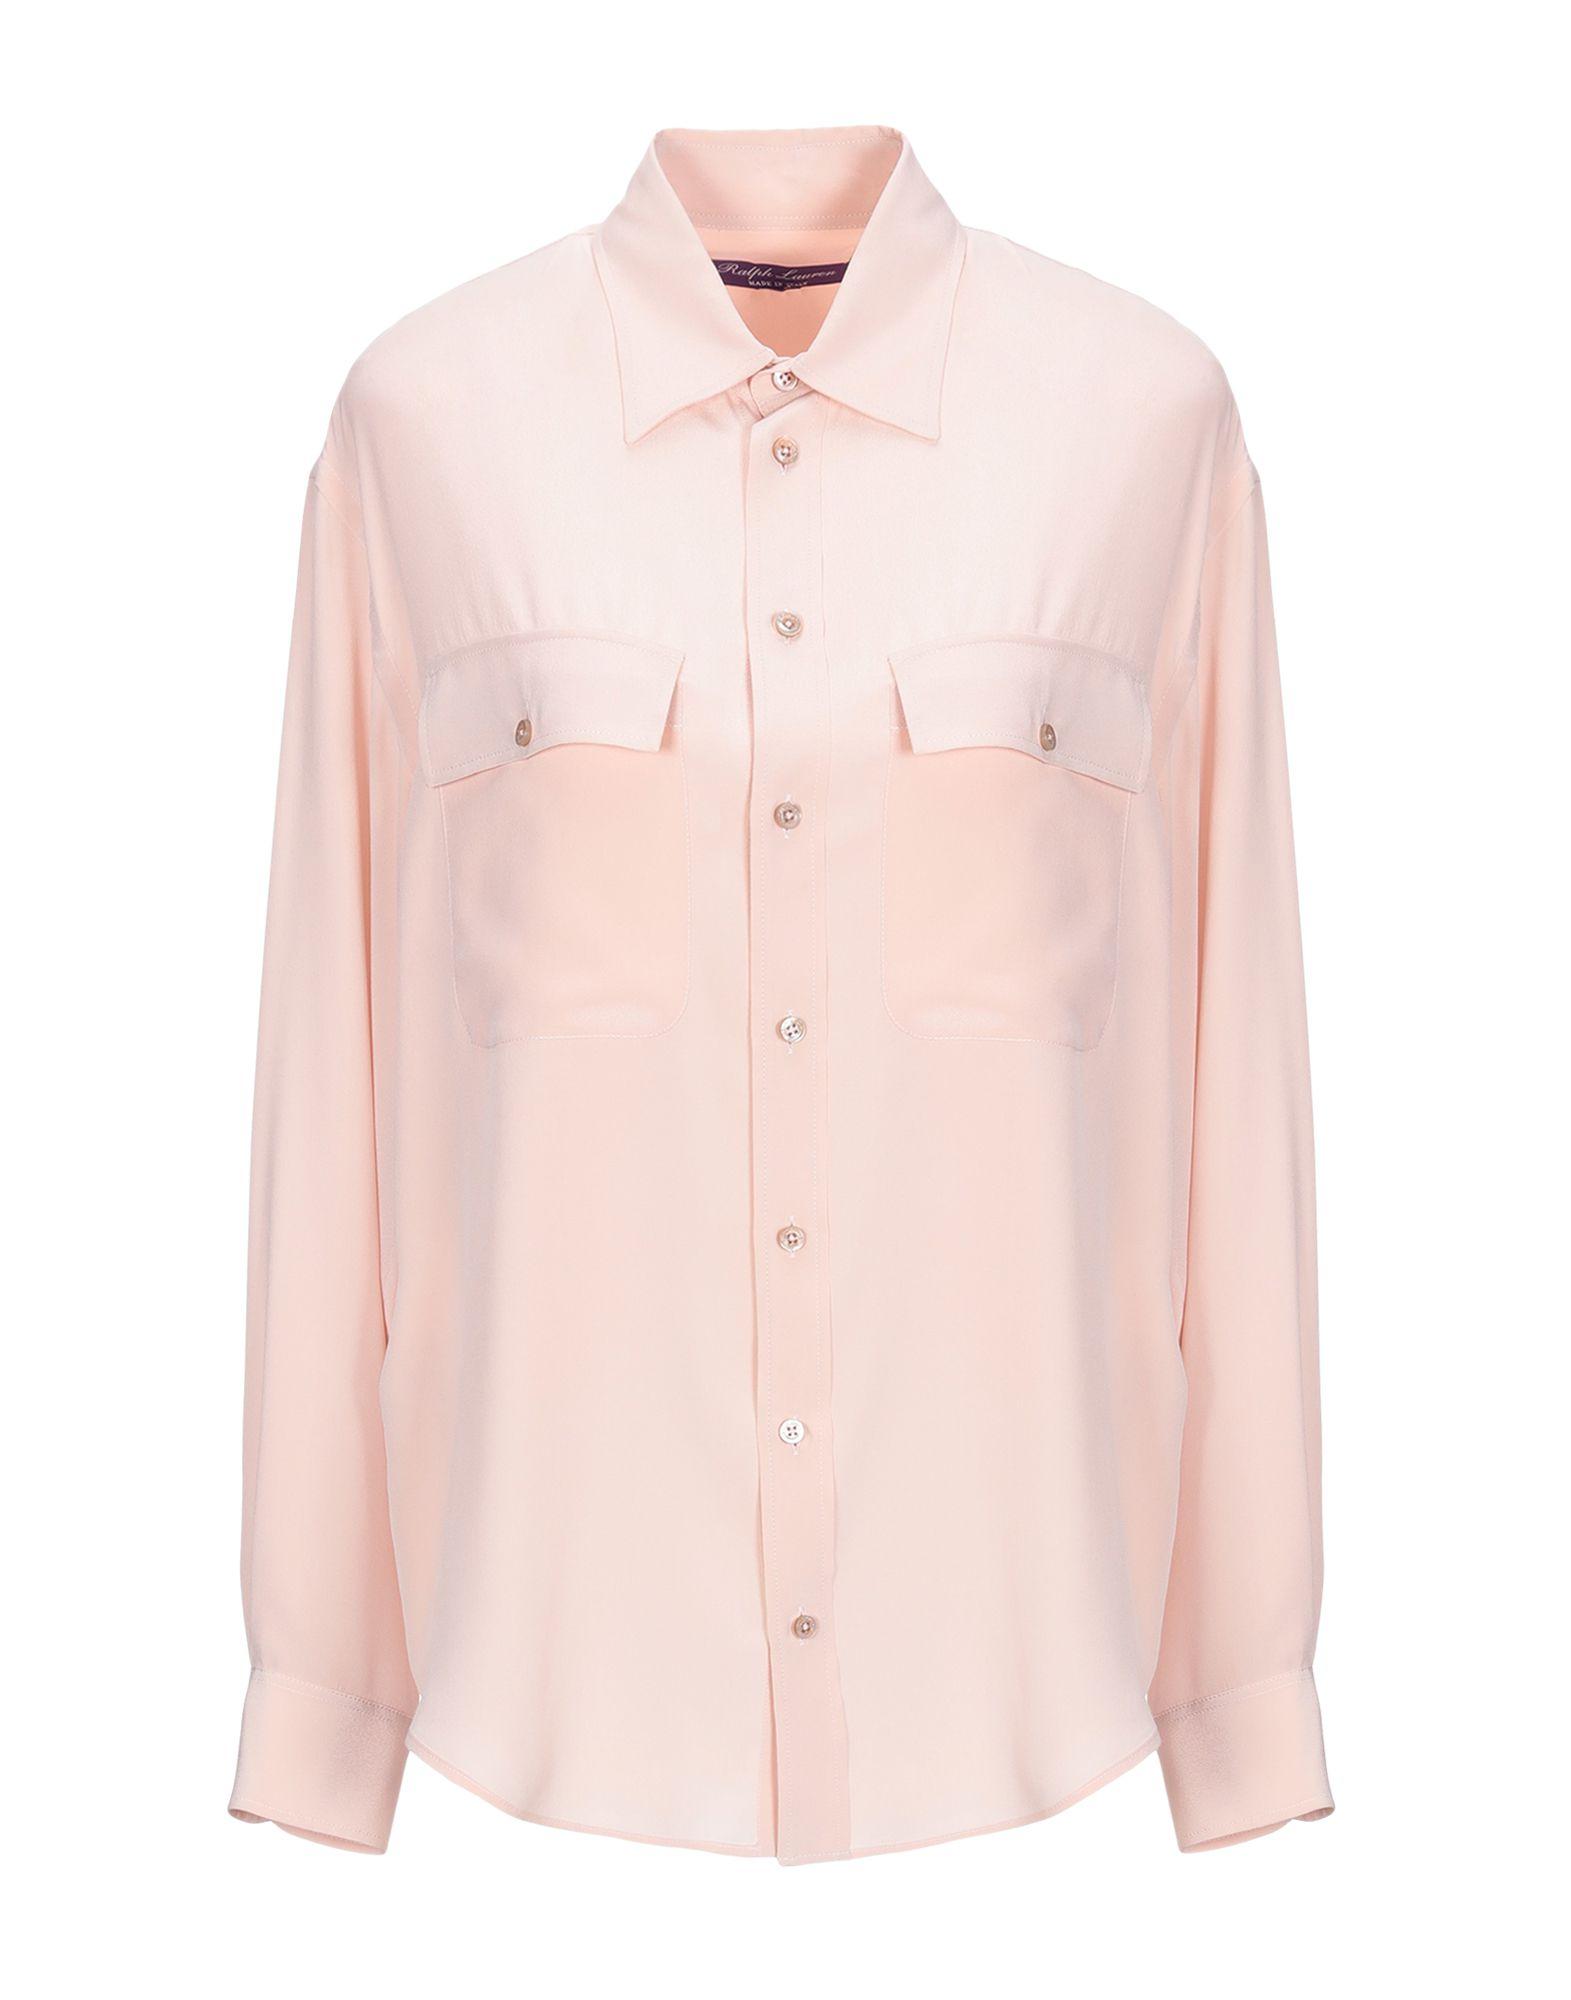 RALPH LAUREN COLLECTION Pубашка